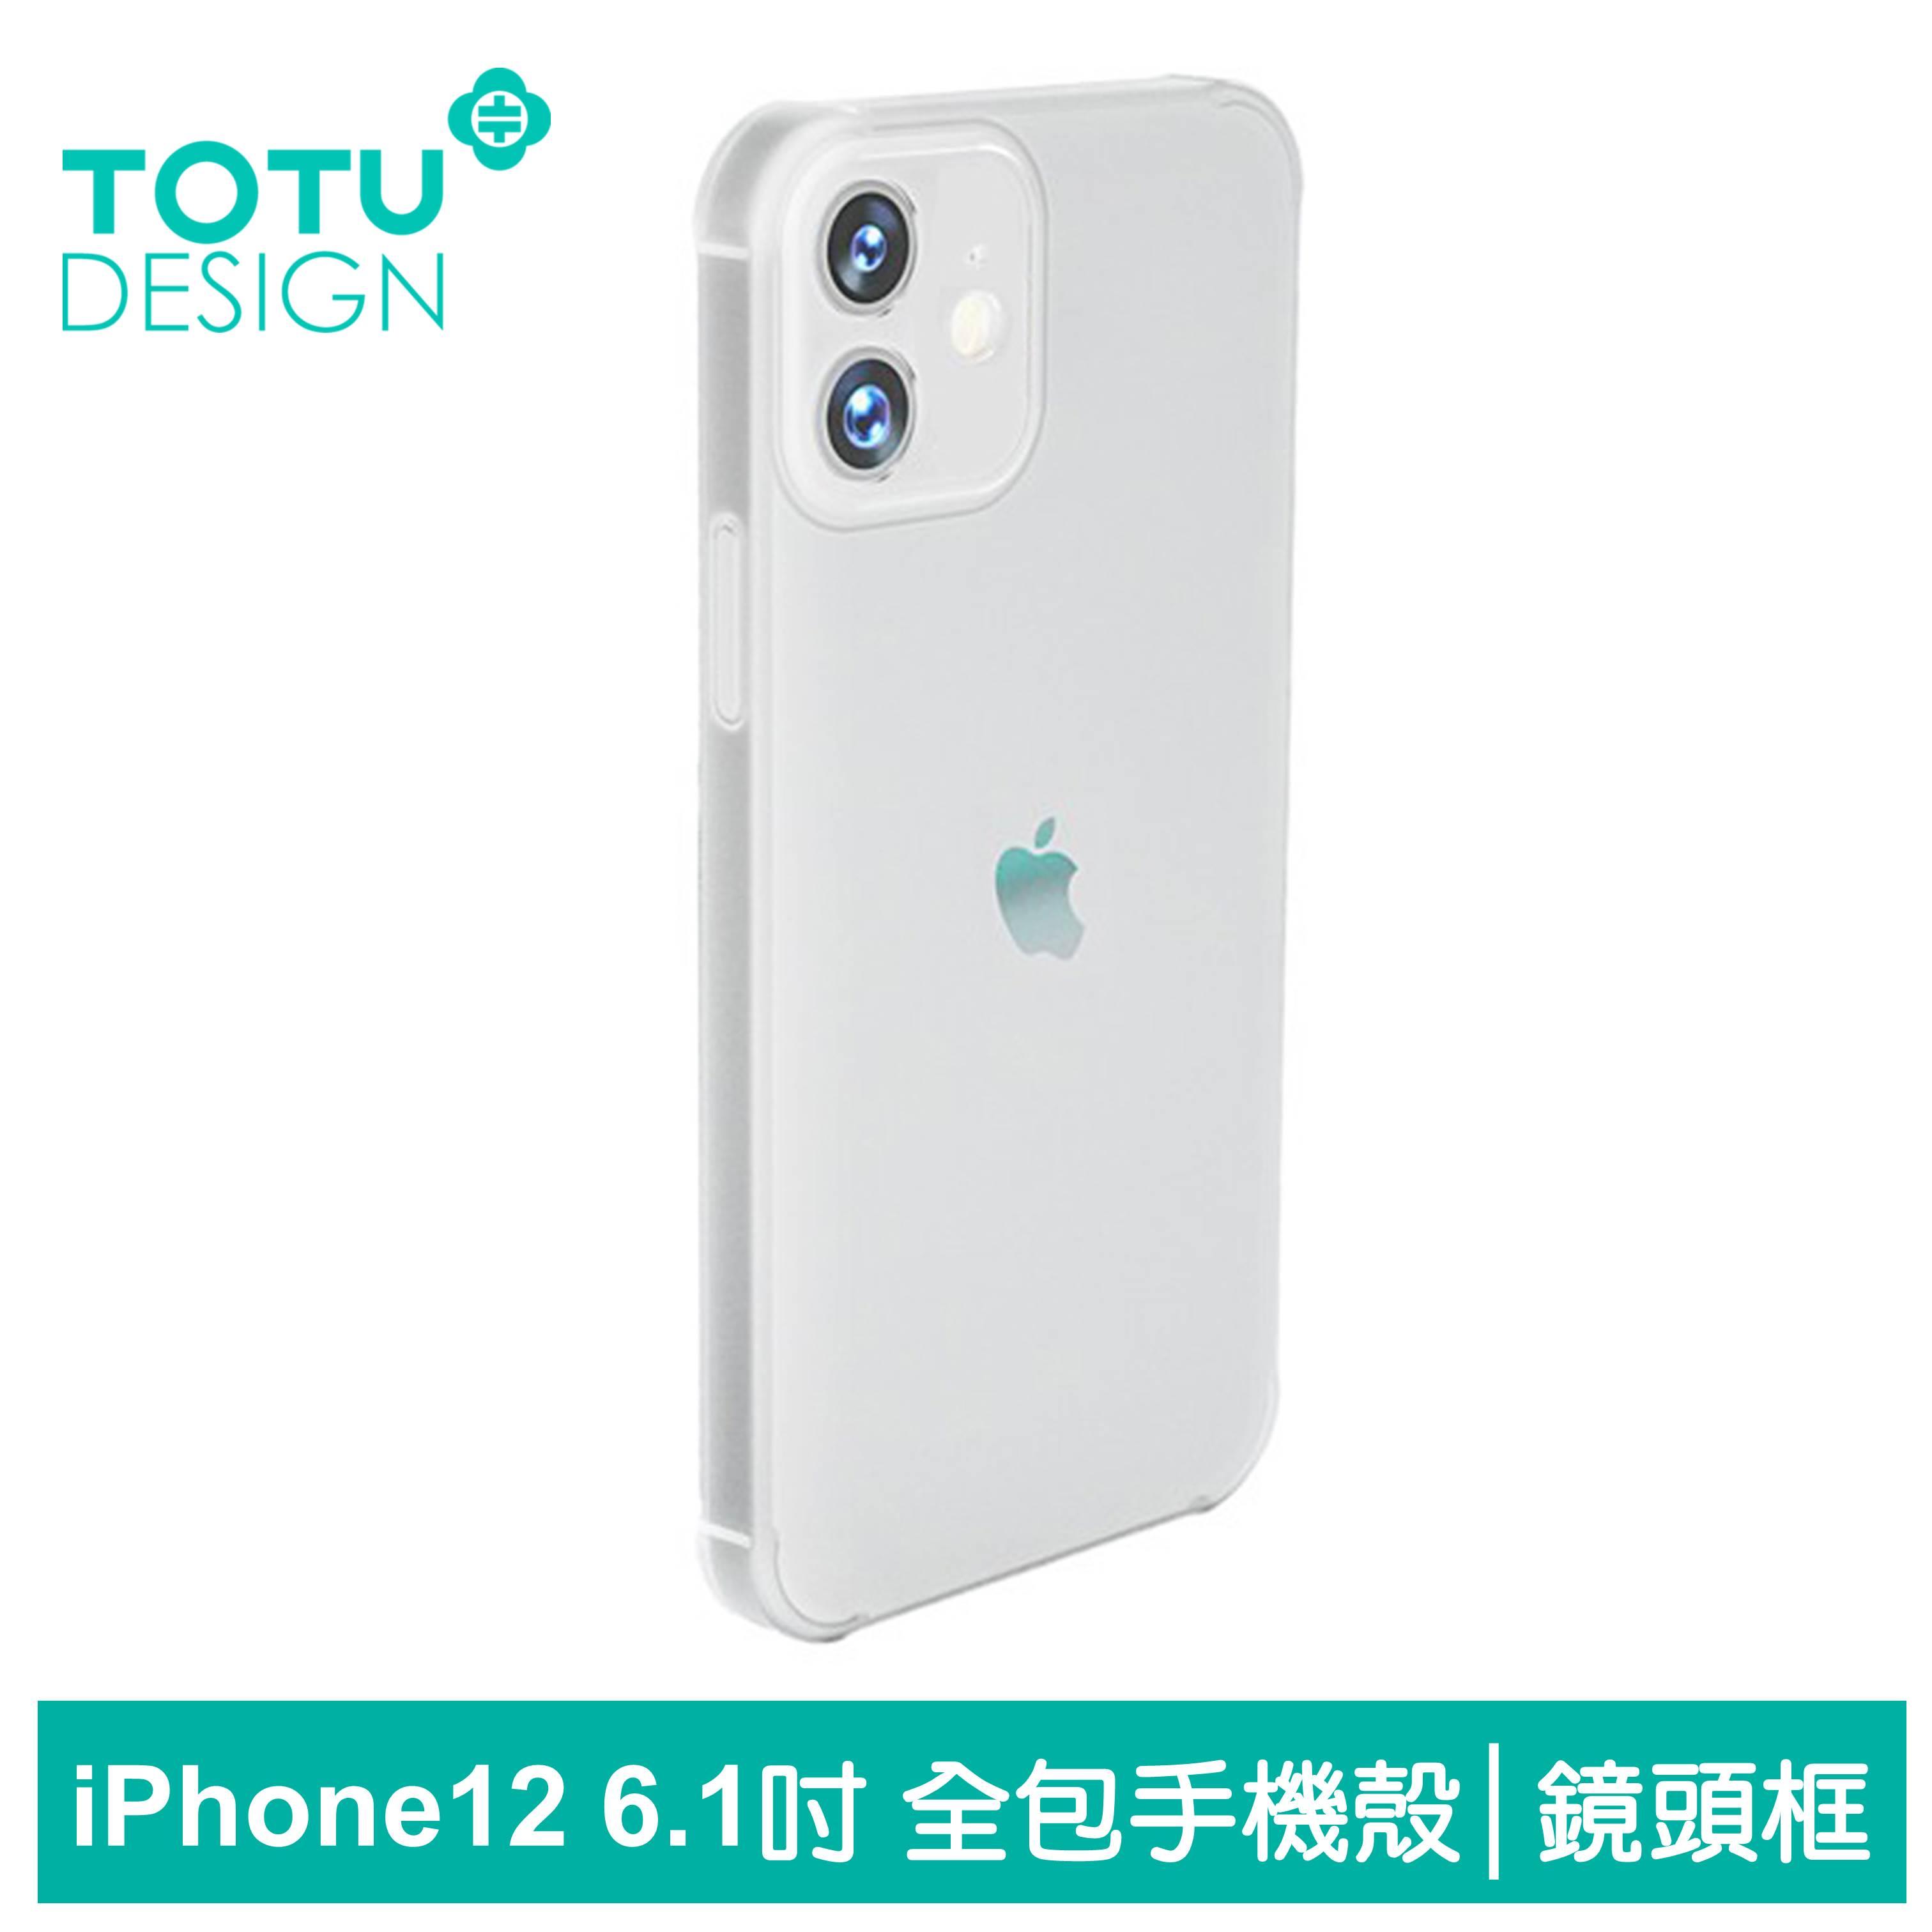 TOTU台灣官方 iPhone 12 6.1吋 手機殼防摔殼保護殼鏡頭框全包硬殼 零感系列 透白